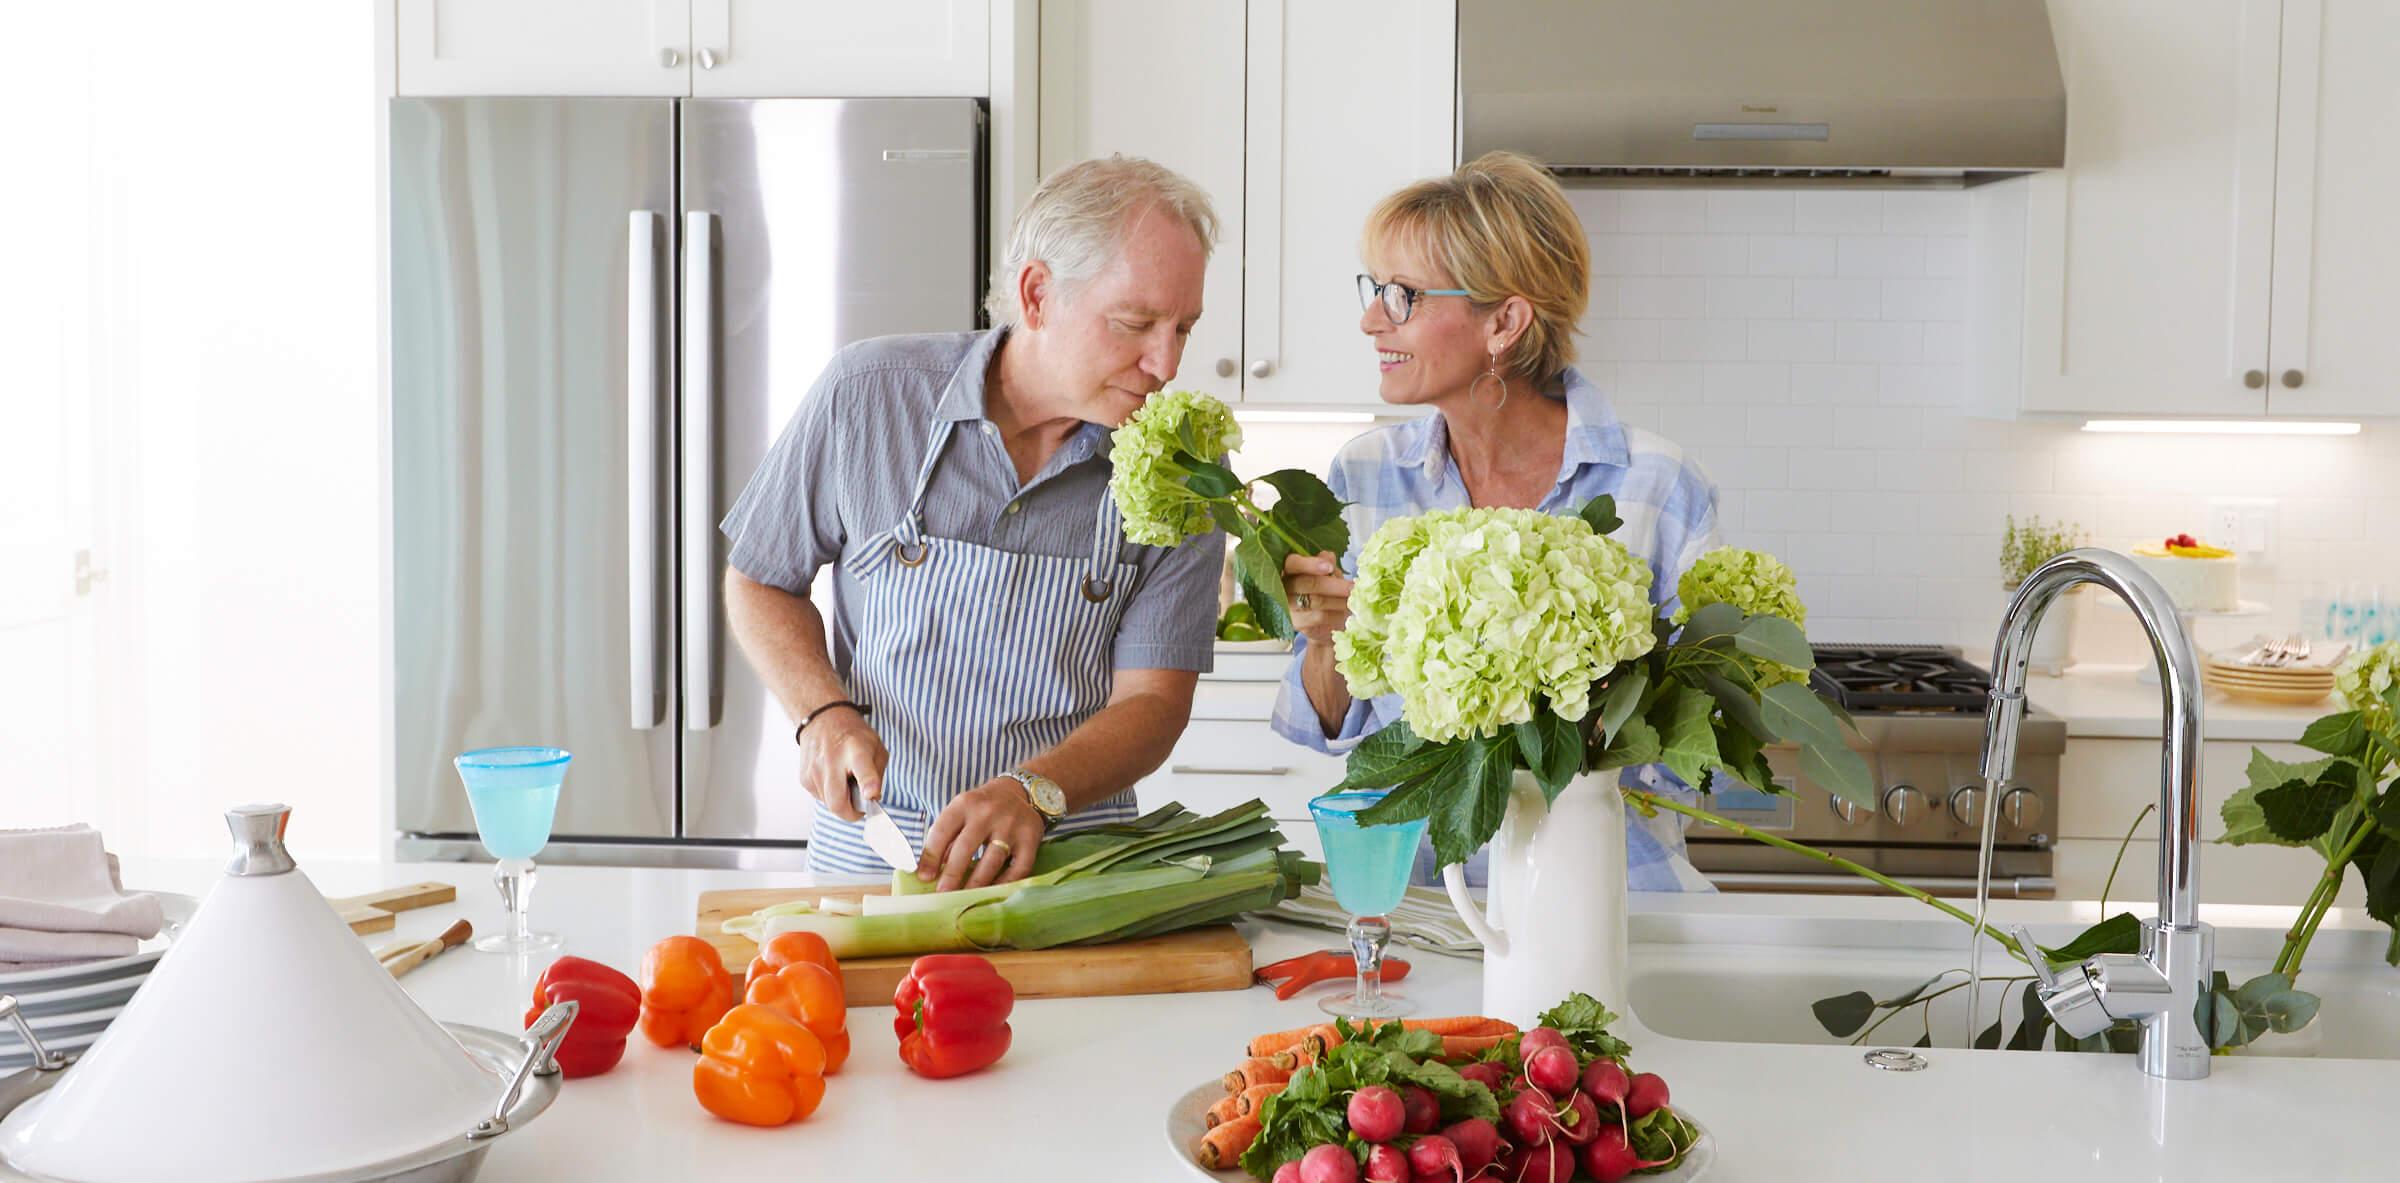 Grandparents Cooking